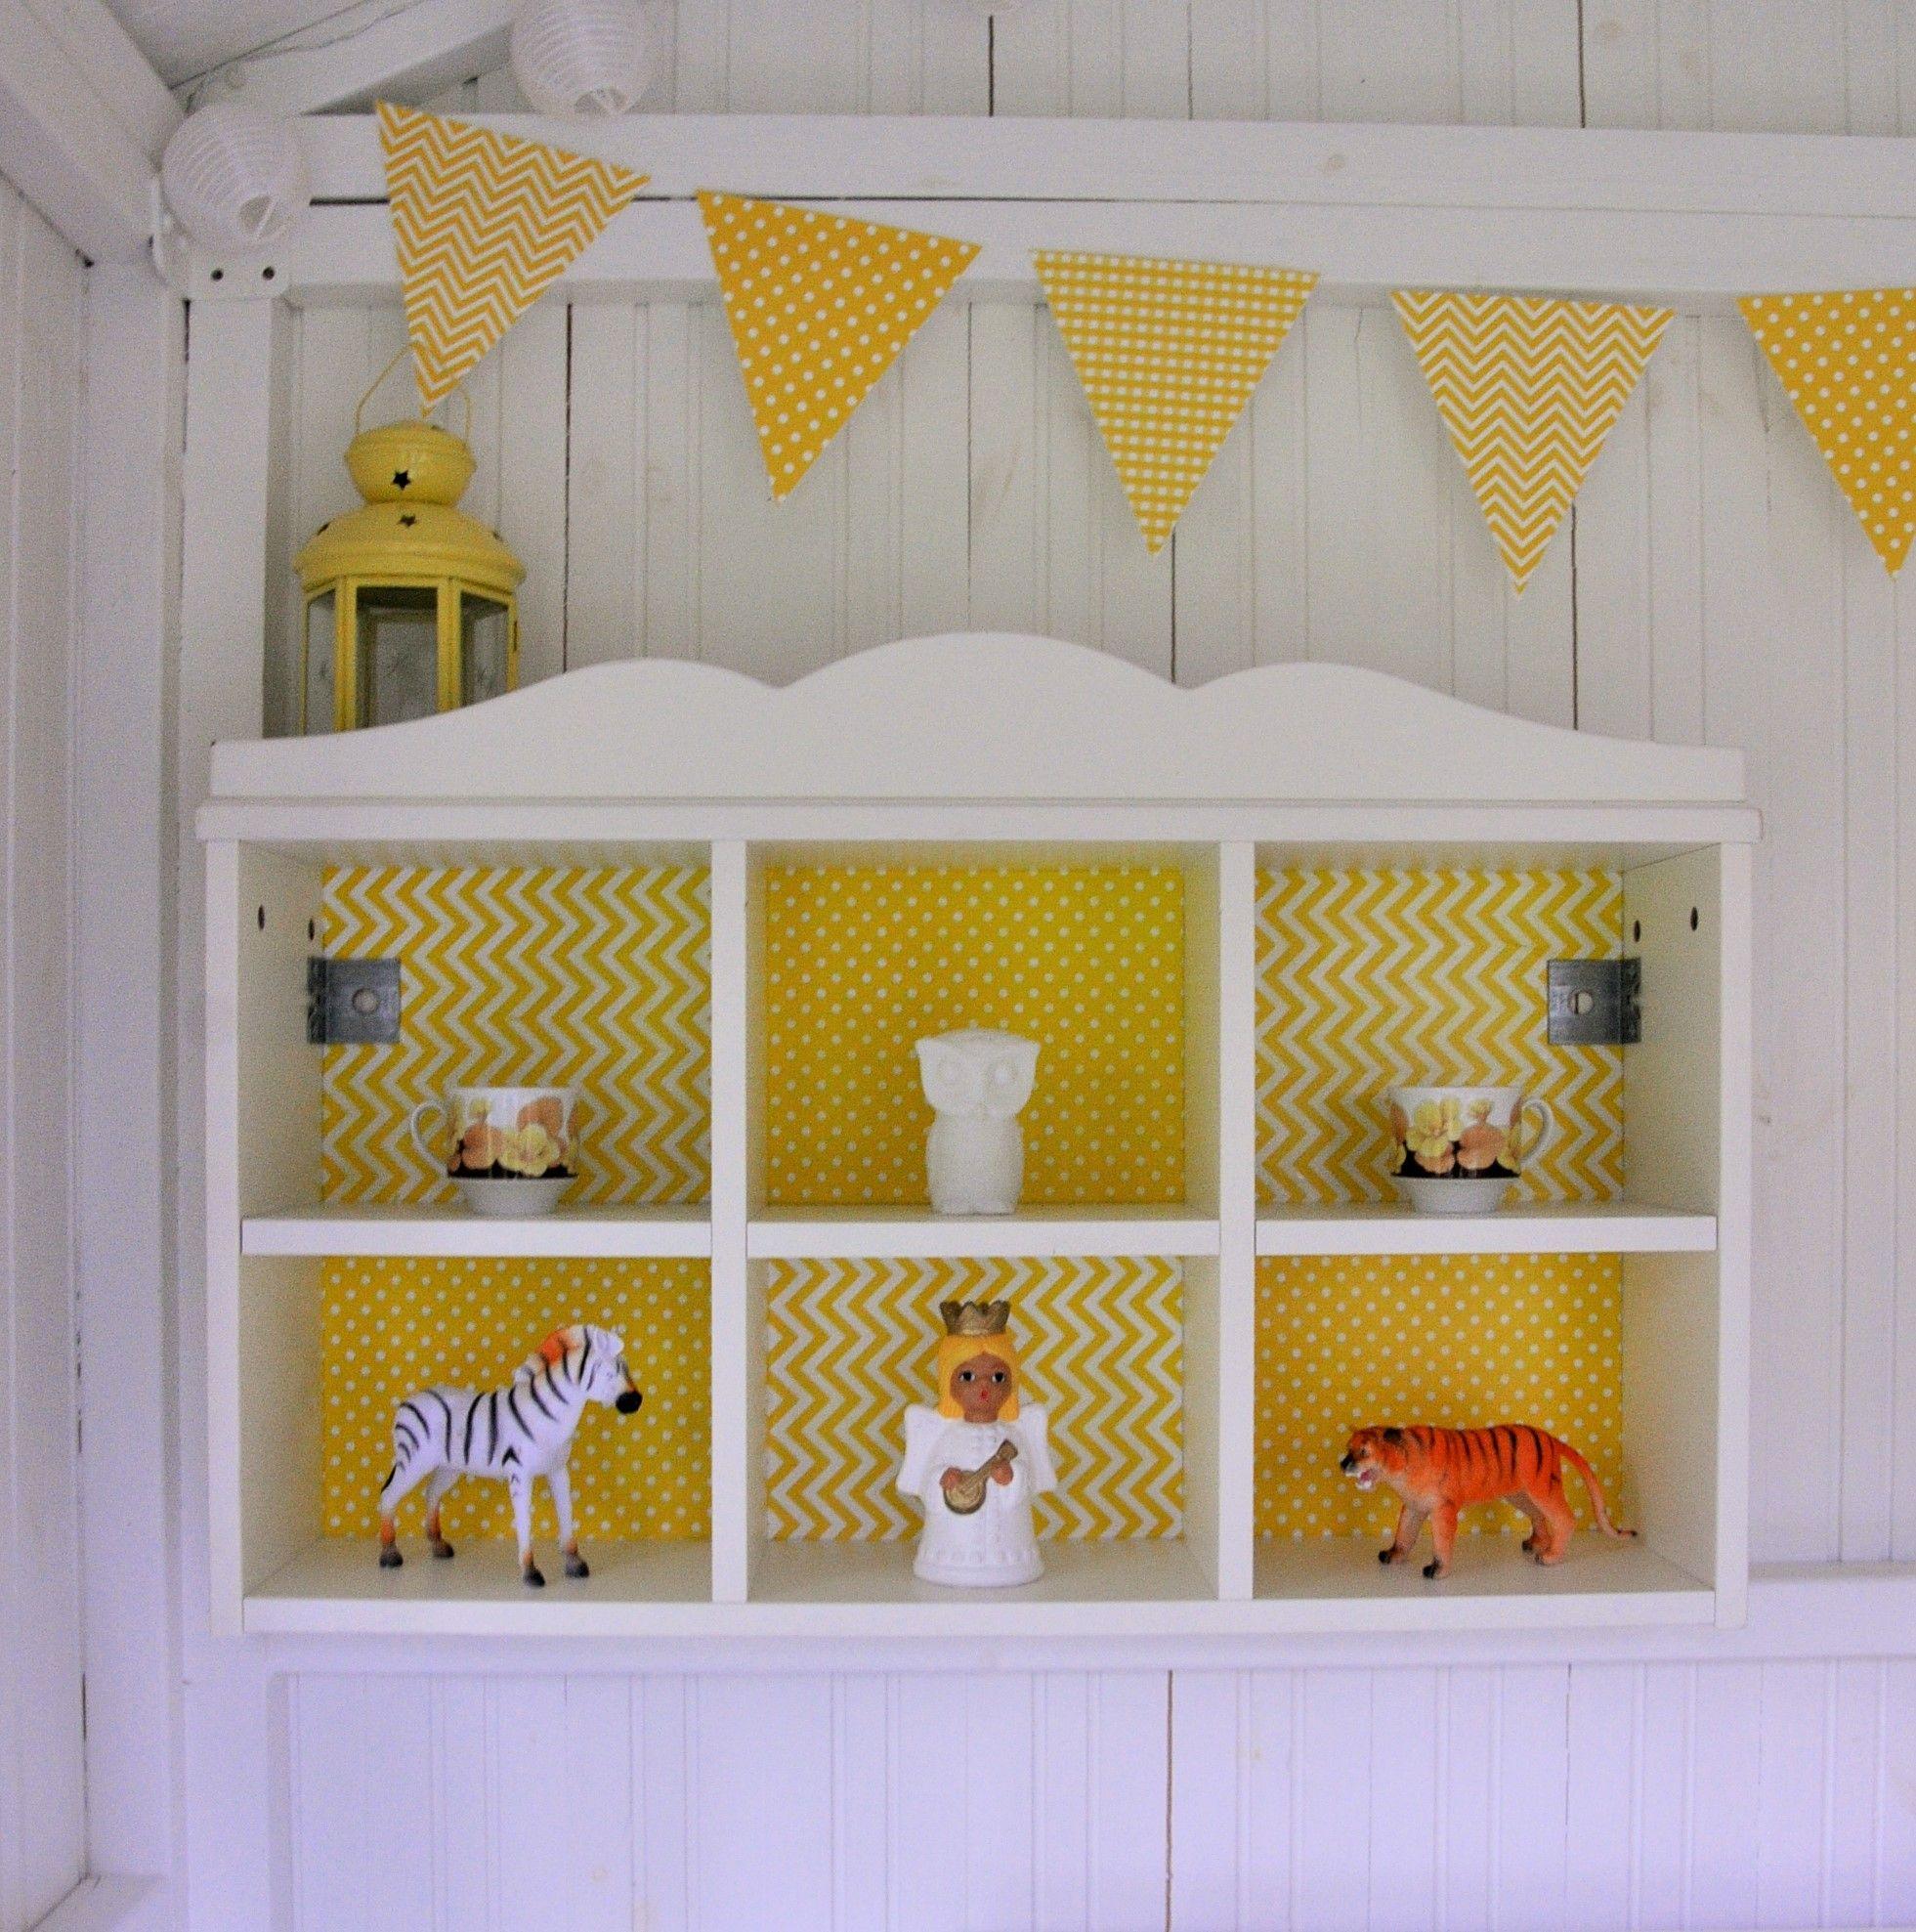 IKEA hack - Hensvik shelf | kids | Pinterest | Ikea hack, Shelves ...